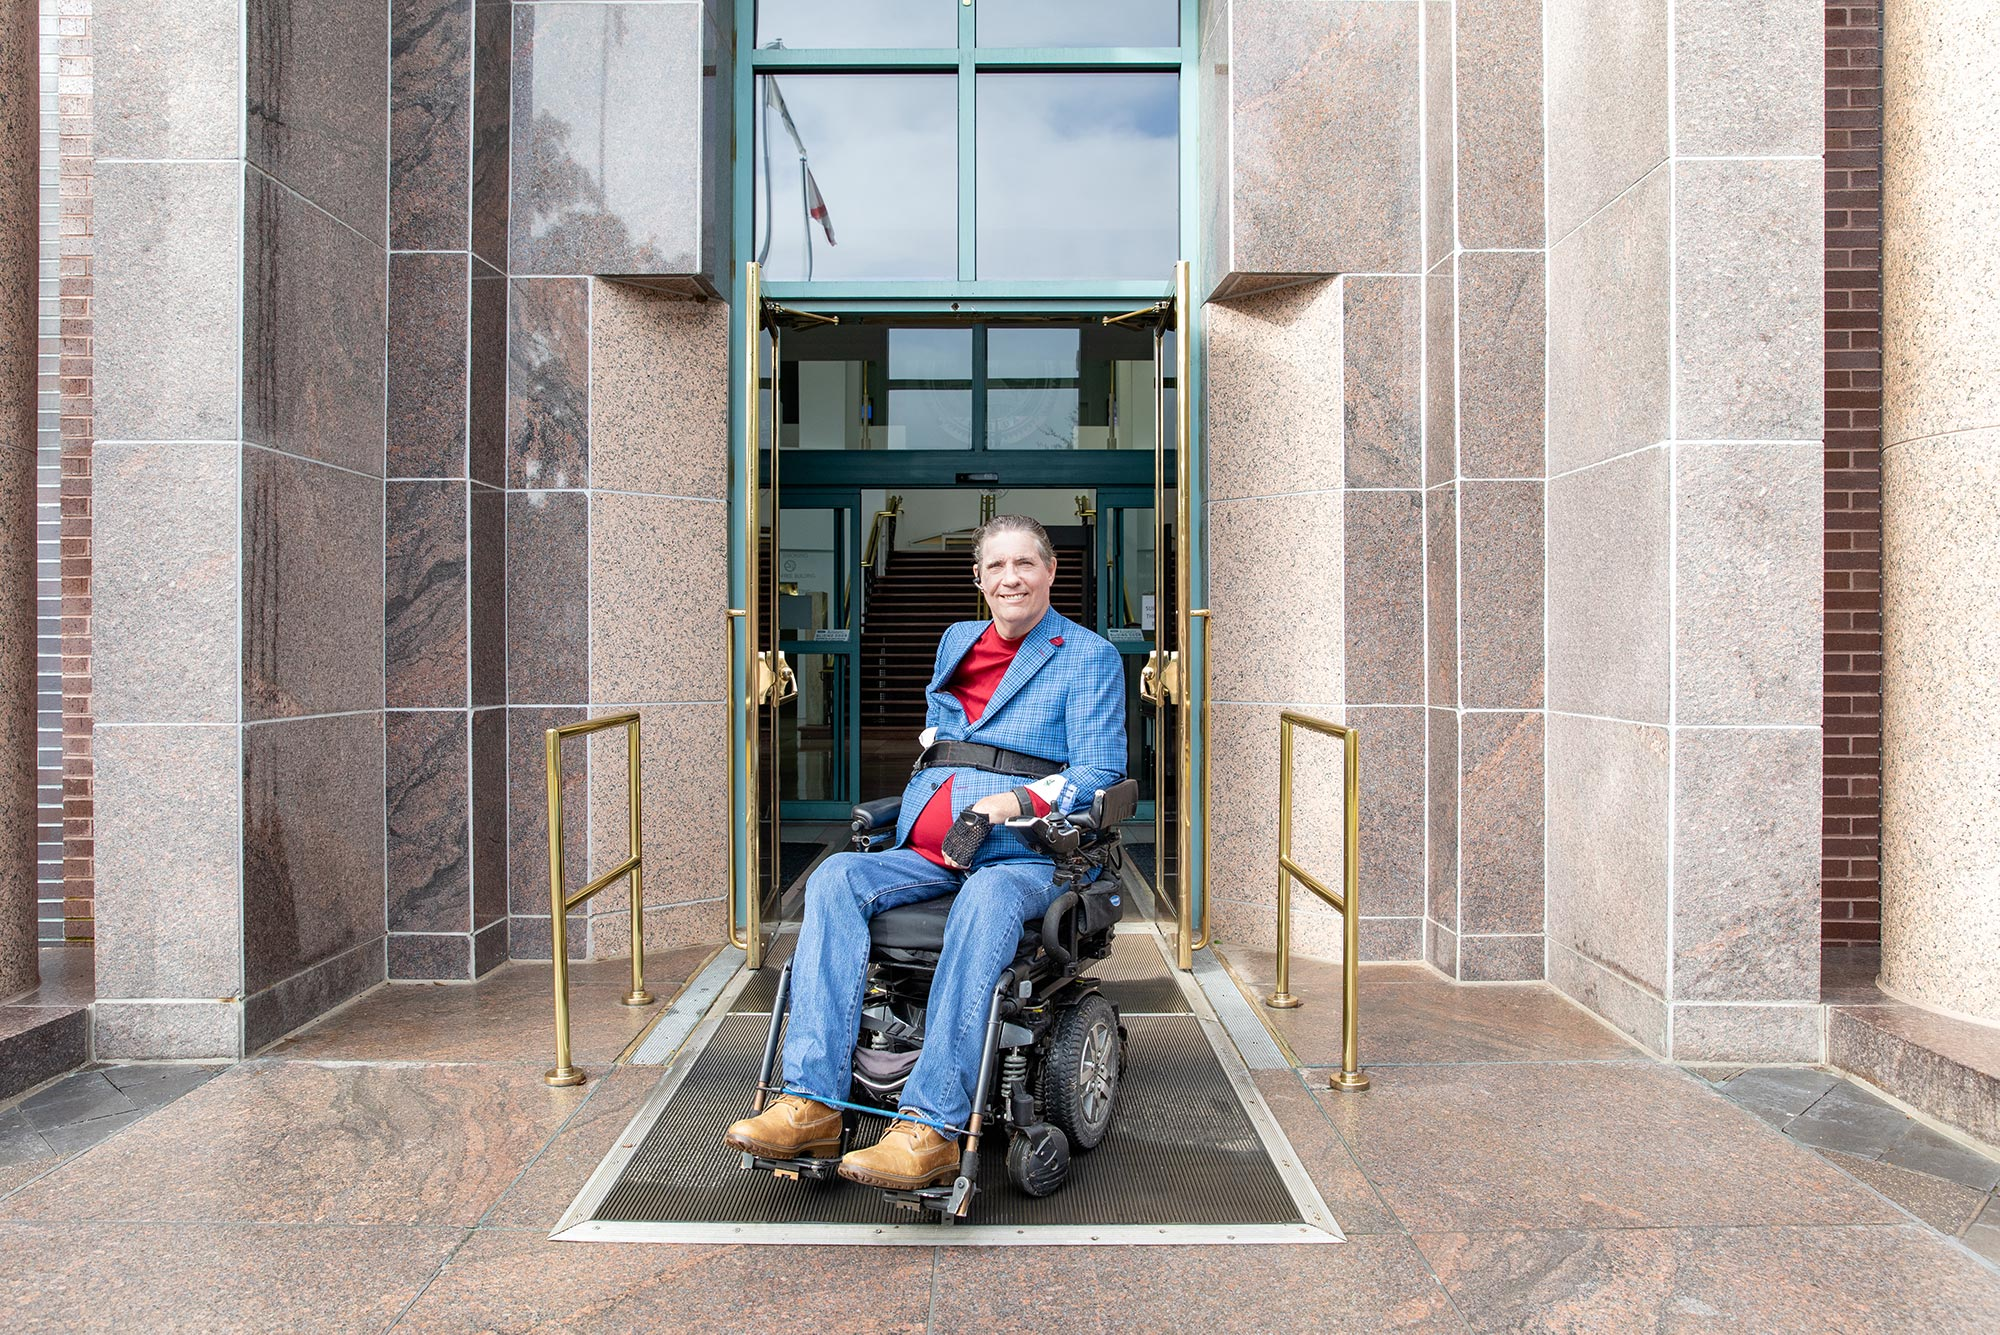 University of West Florida Graduate, Dr. Harding, disability advocate